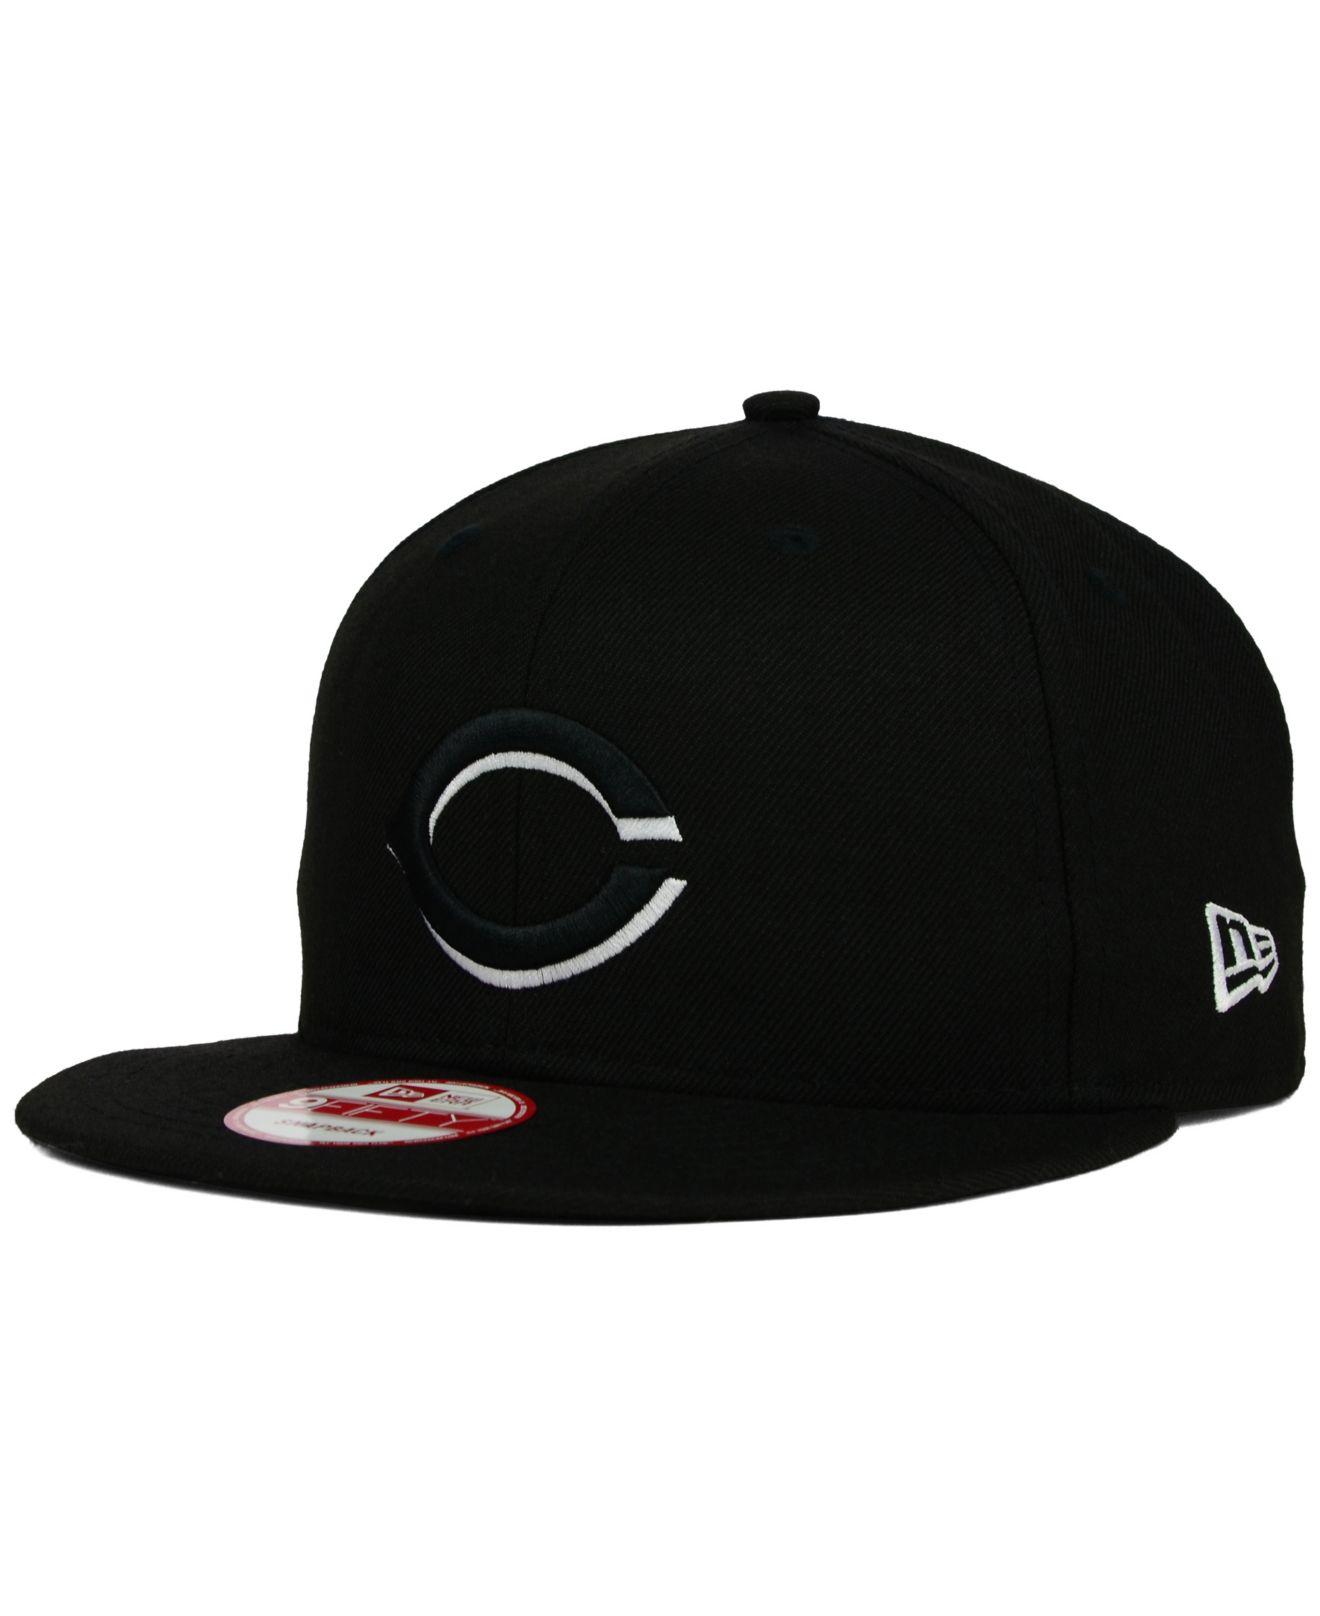 Ktz Cincinnati Reds Black White 9fifty Snapback Cap In